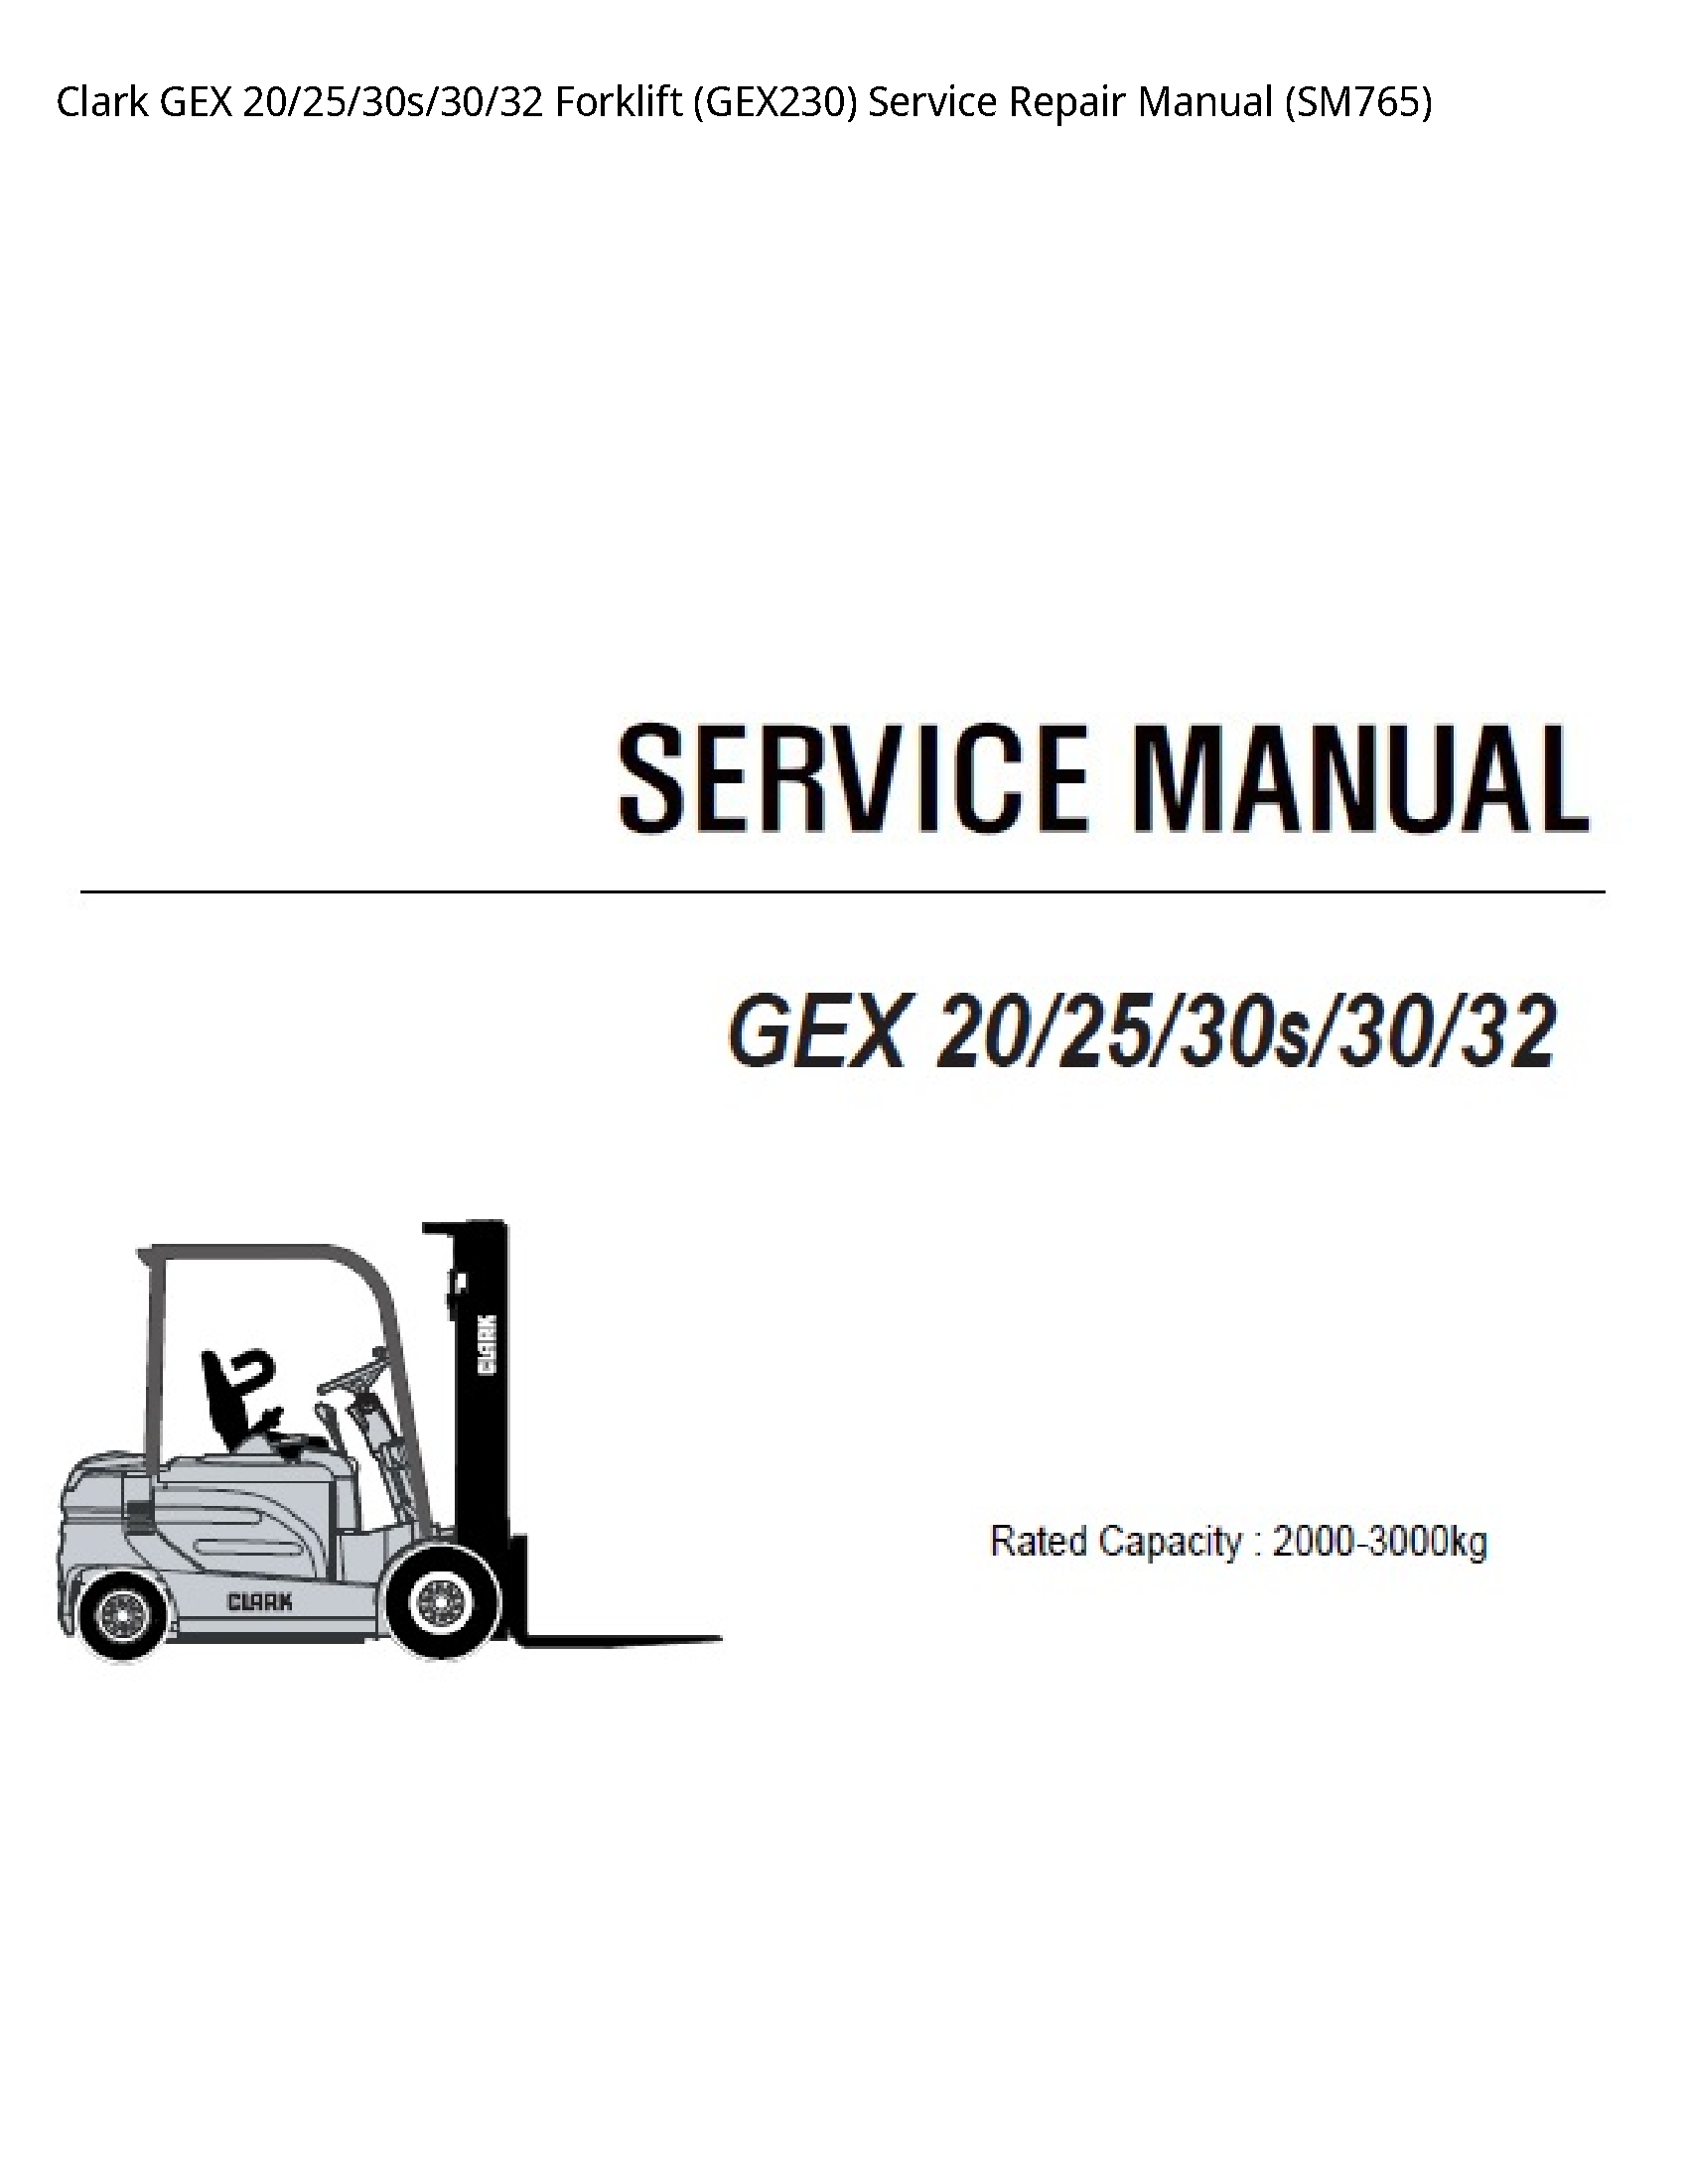 Clark 20 GEX Forklift manual